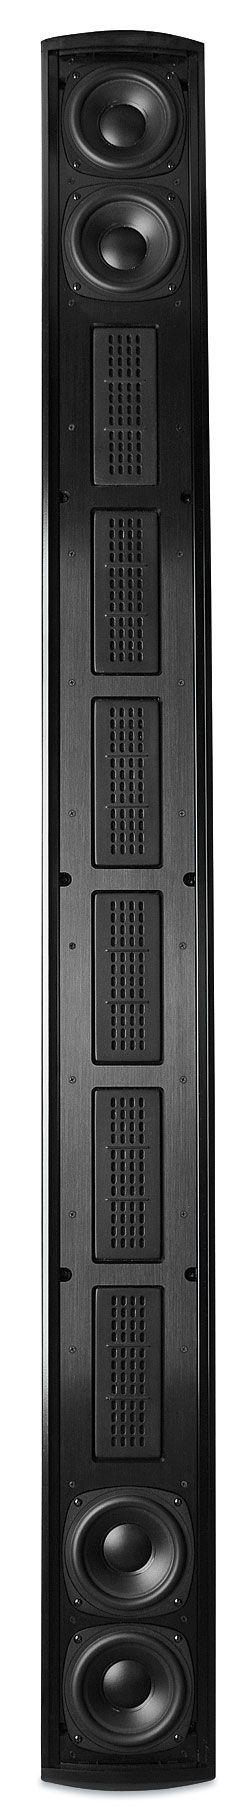 BG Radia LA-550 In-Wall Speaker System | Sound & Vision